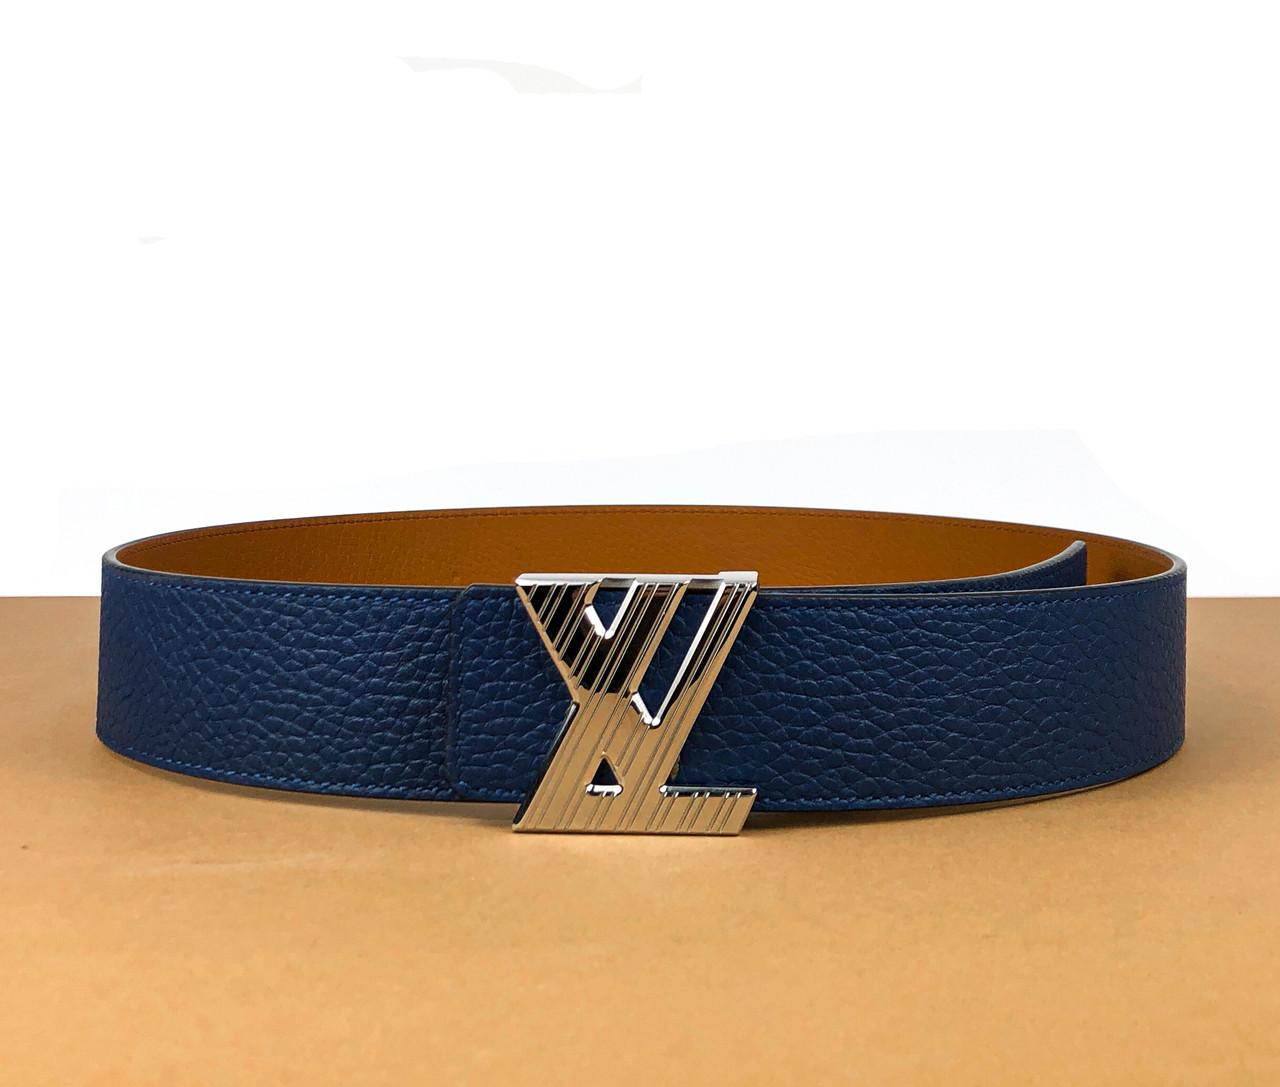 Мужской ремень от Louis Vuitton (Луи Витон) арт. 61-09